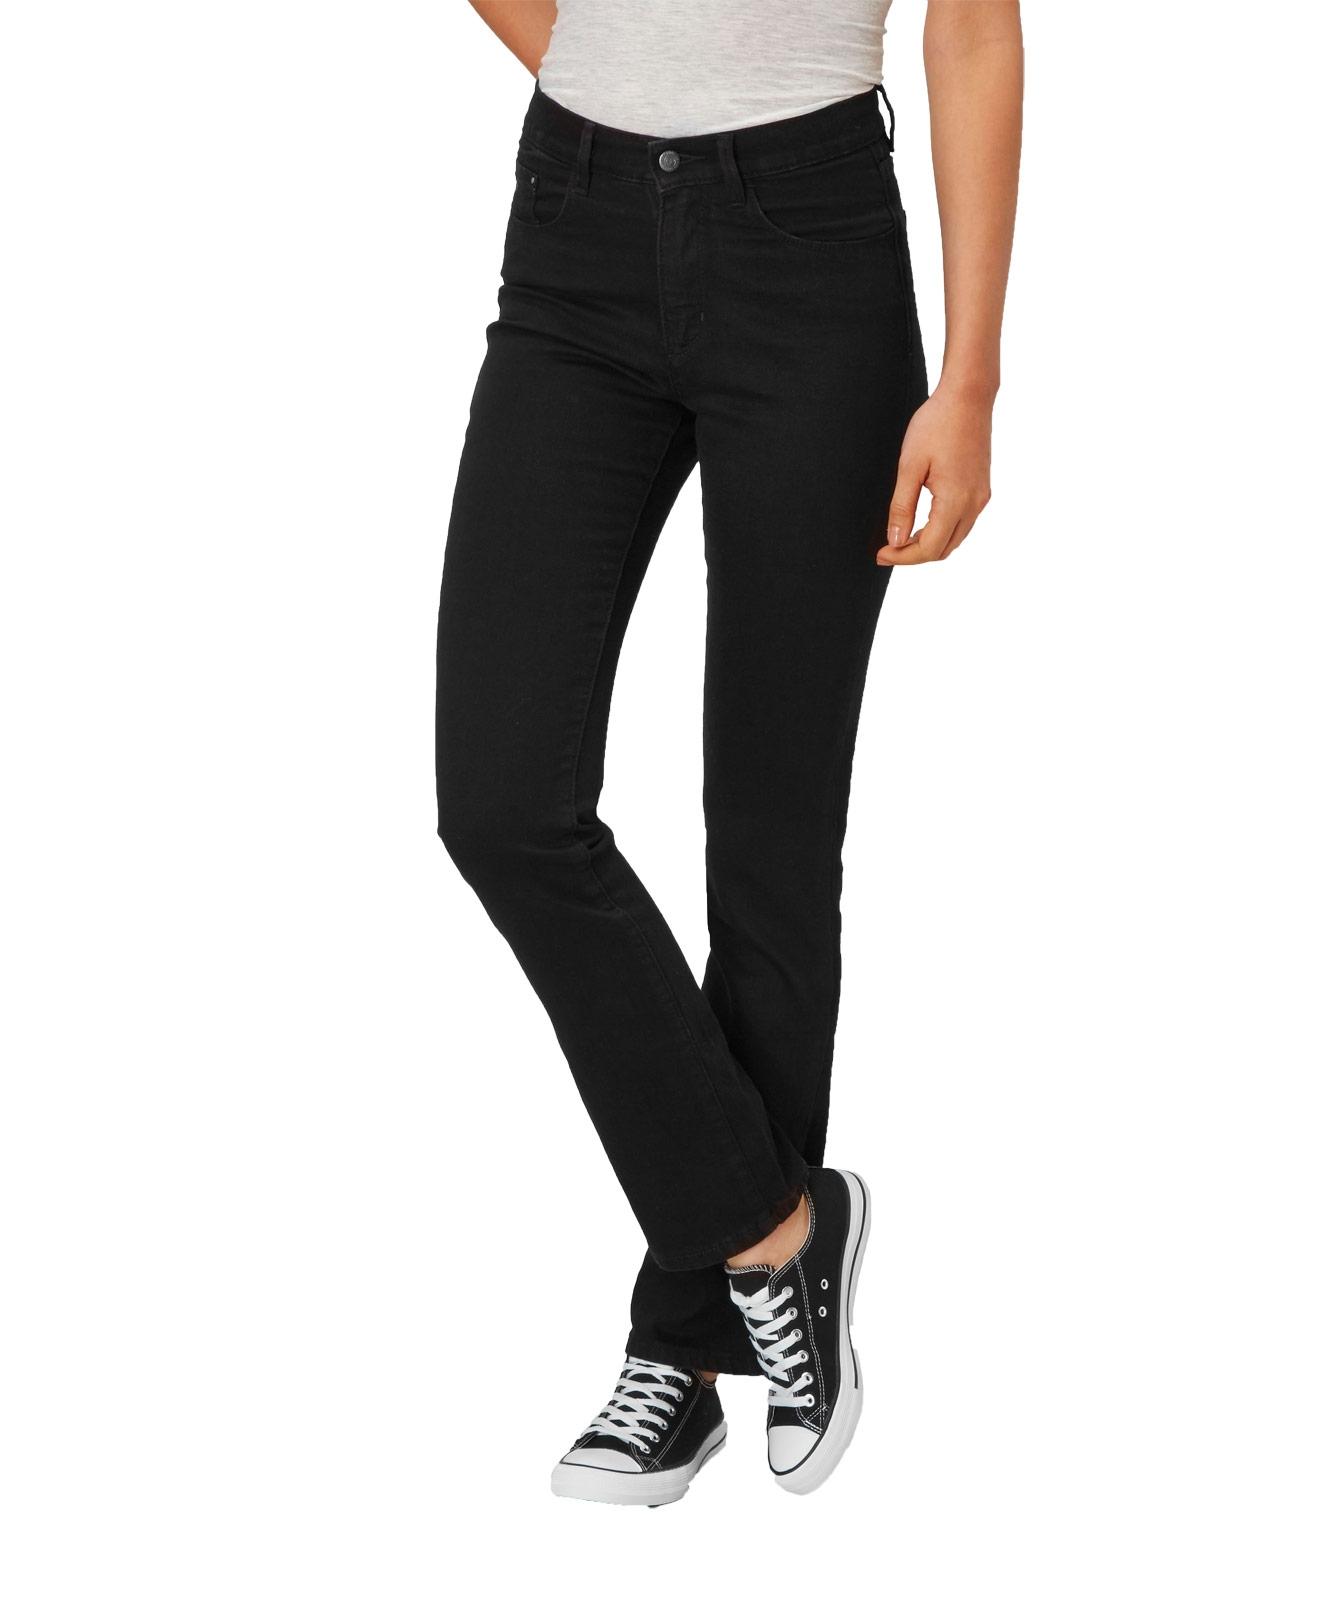 Hosen - Paddocks Straight Leg Jeans Kate in Black Black  - Onlineshop Jeans Meile